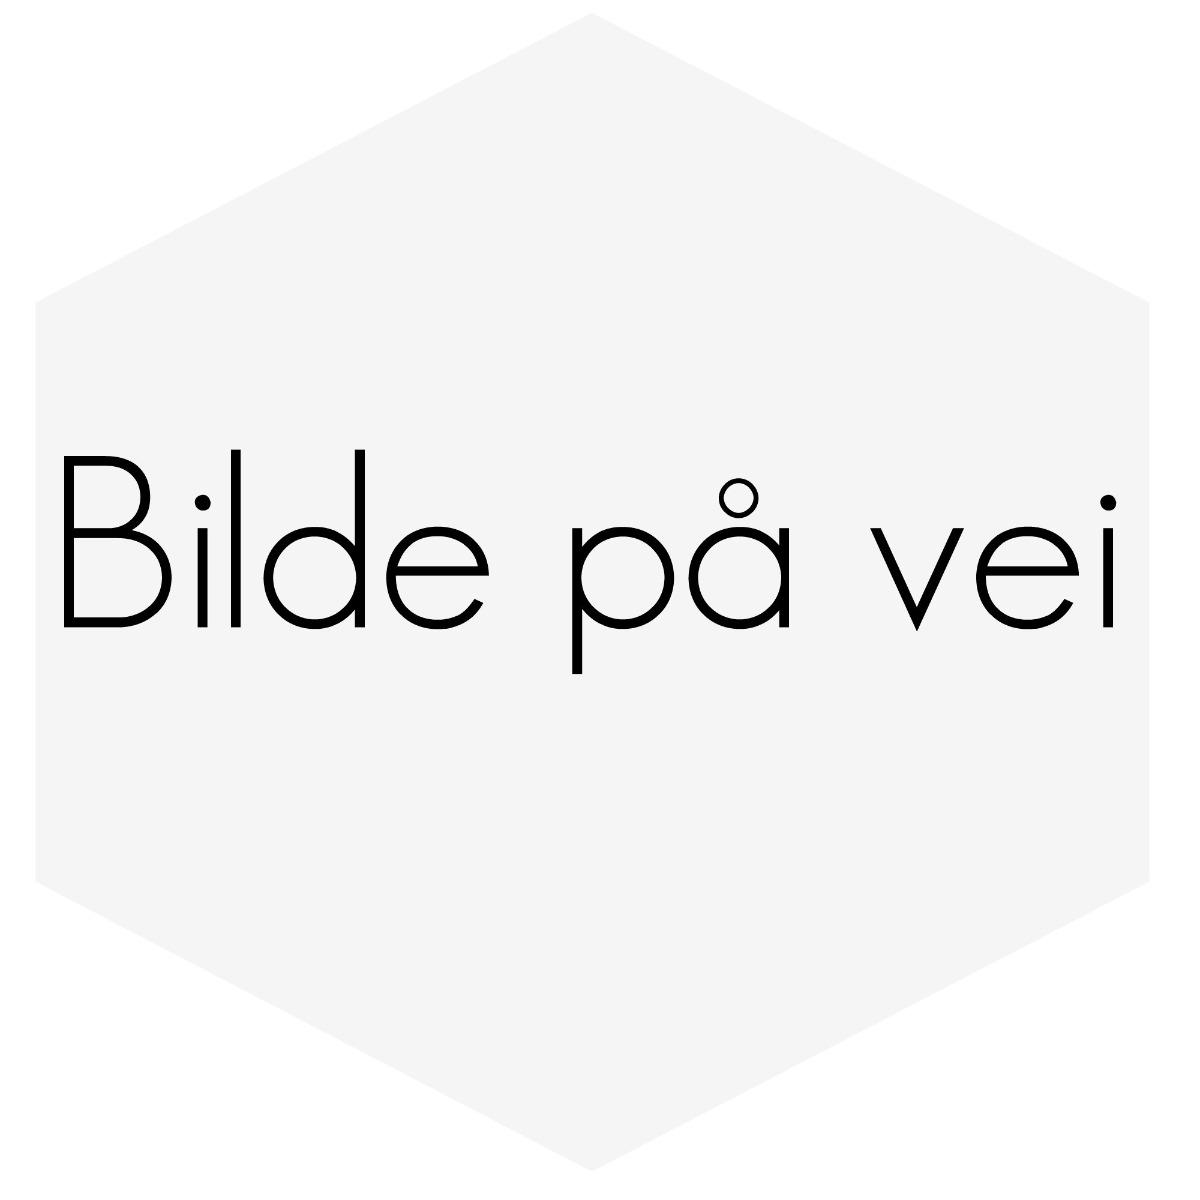 SILIKONSLANGE TILLEGGSATS VANN 7/900 M/AC RØD=BESTILLINGVARE